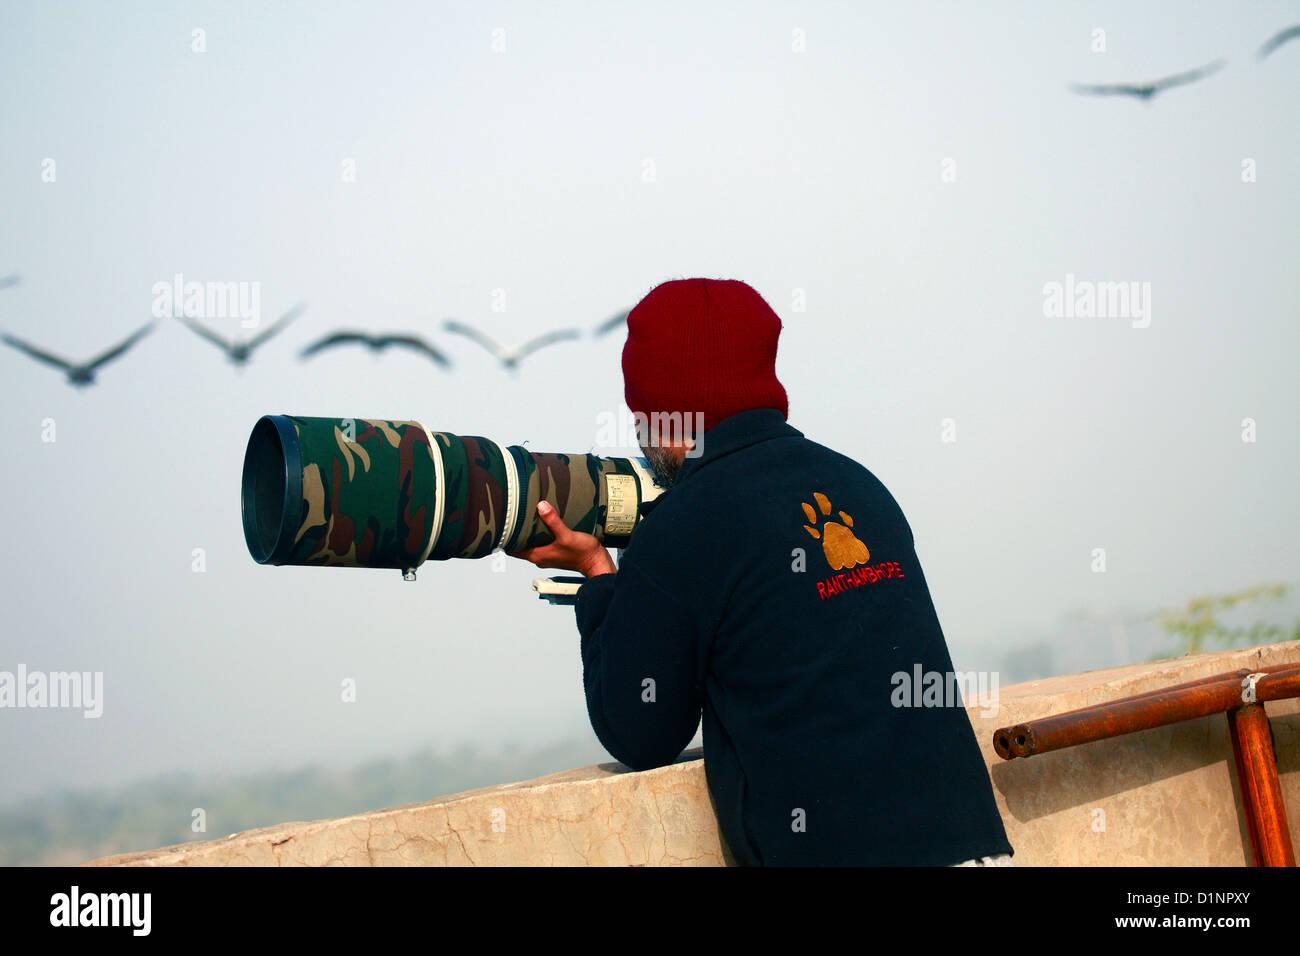 Photographe professionnel Photo Stock